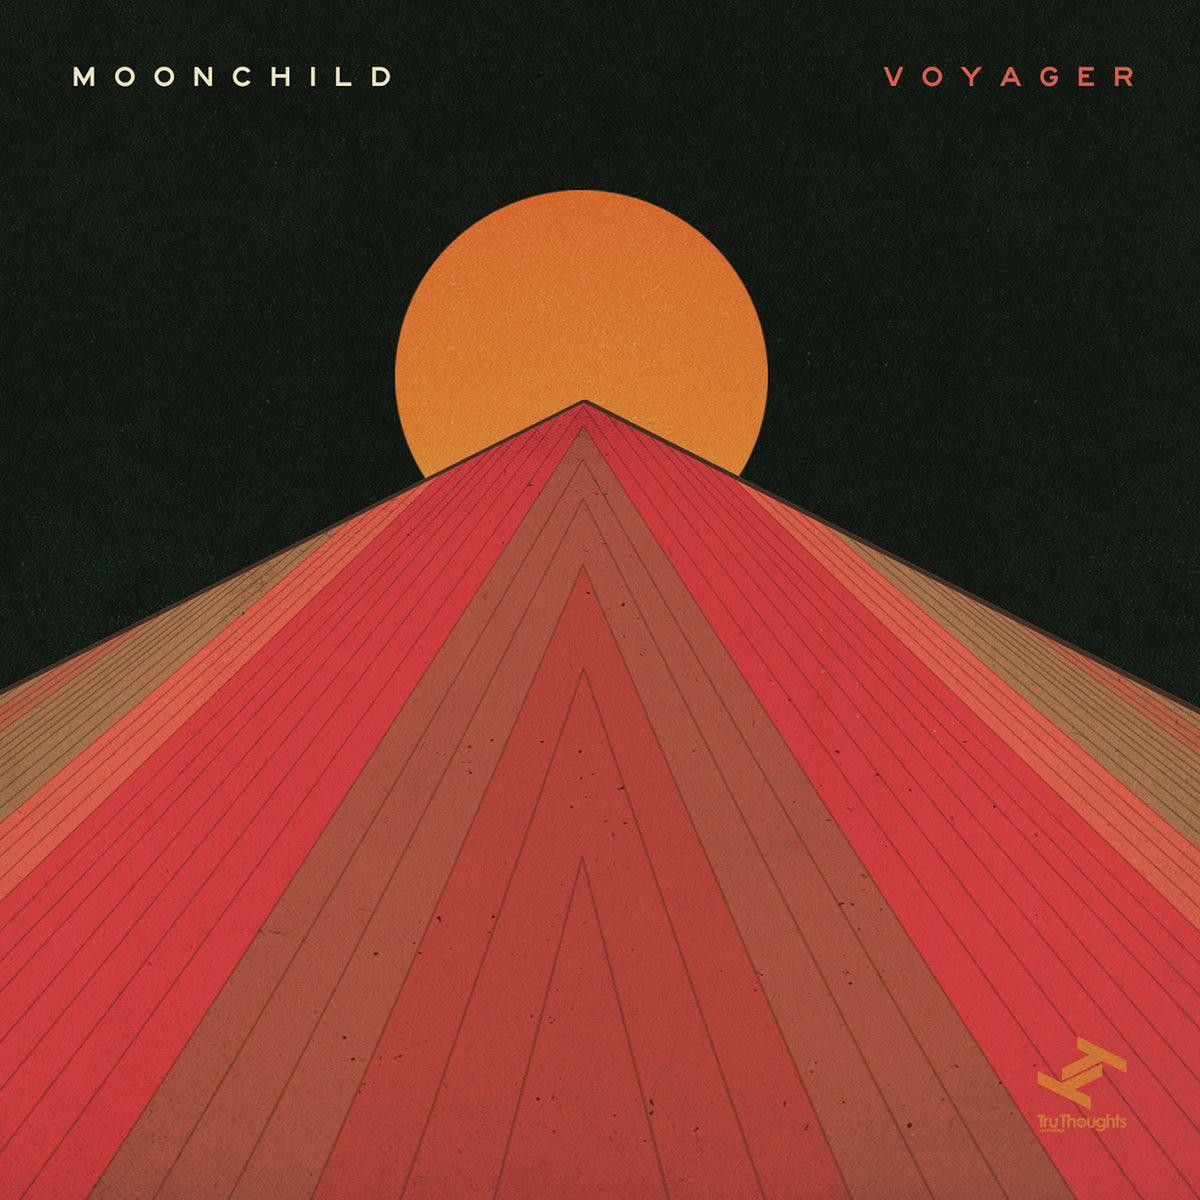 moonchild voyager